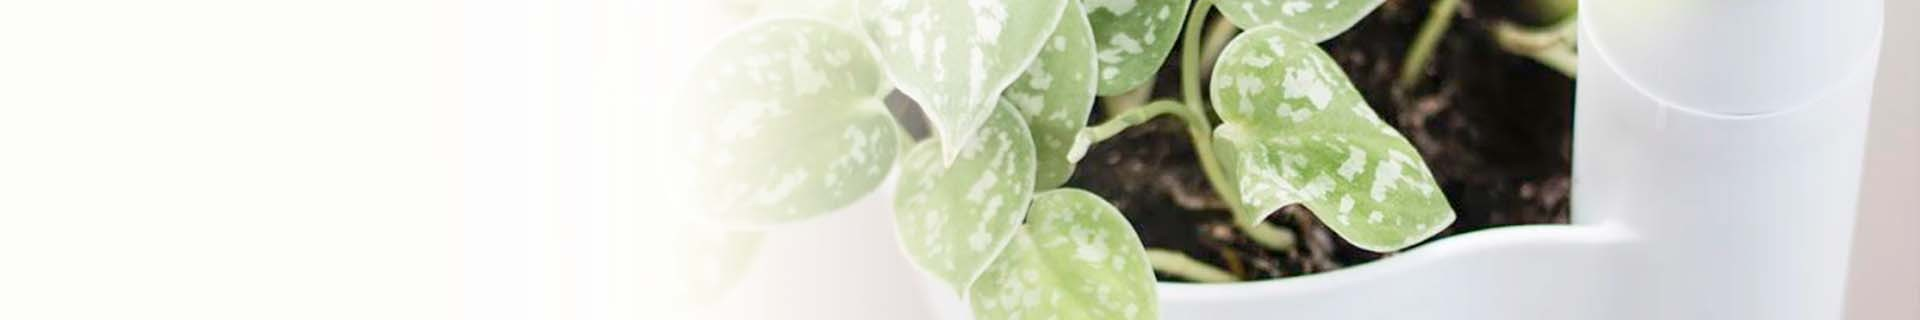 100% recycelte Produkte | CitySens